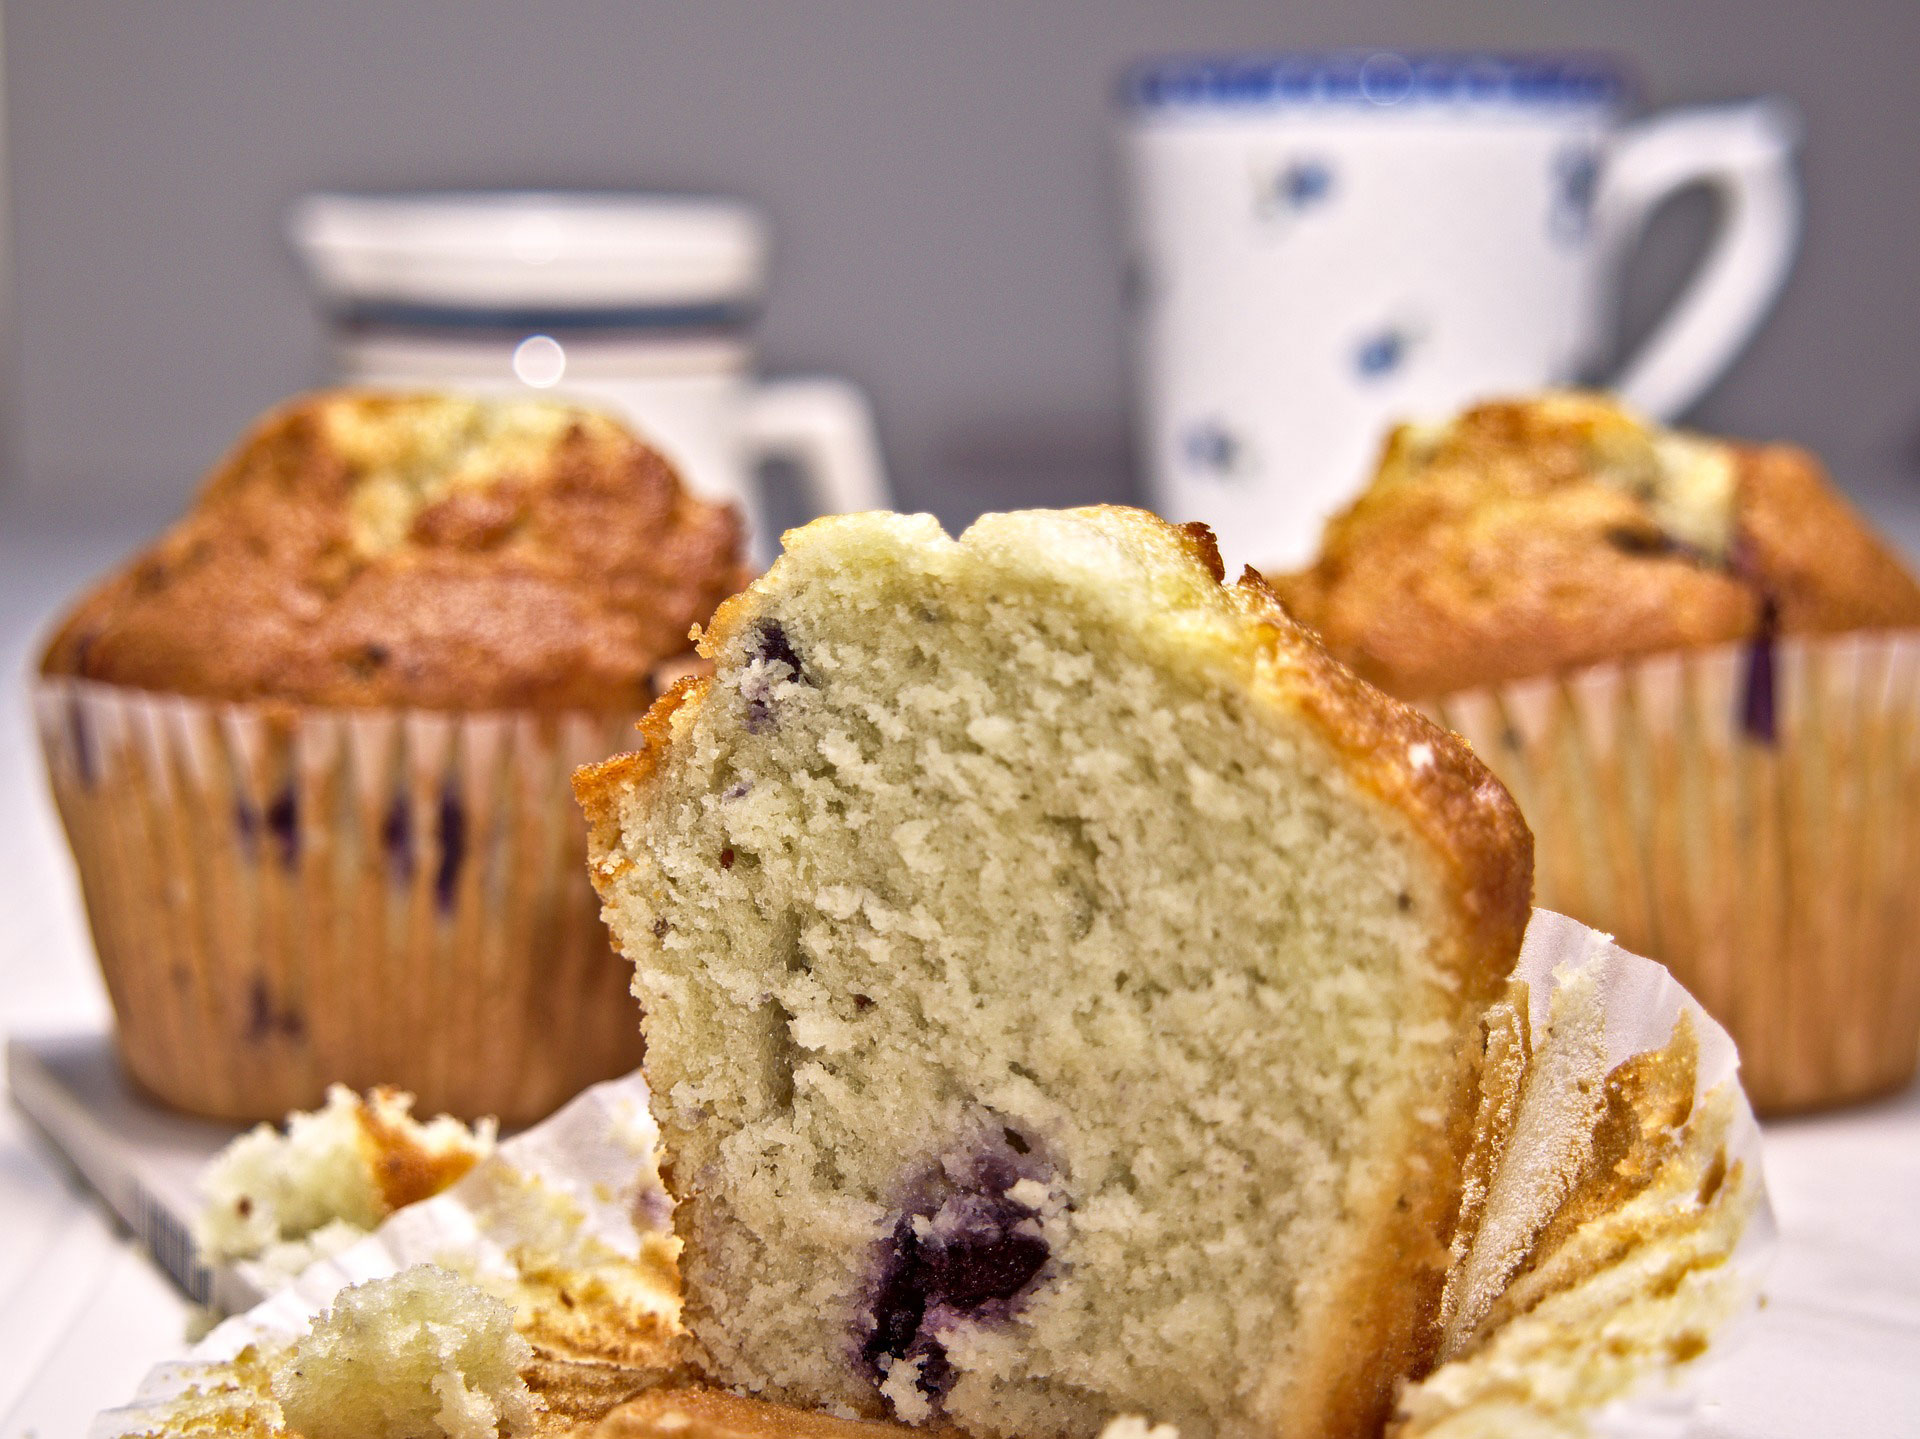 WEB_muffin-3981891_1920